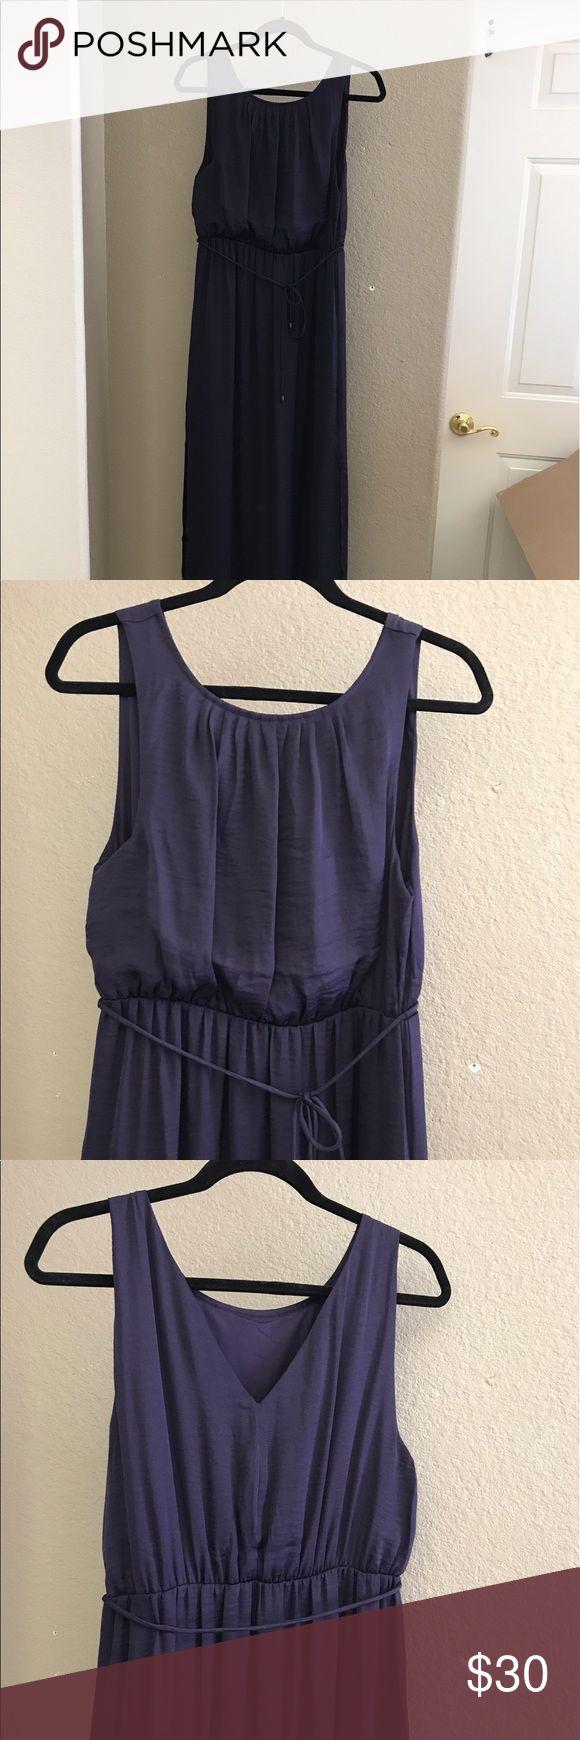 Gap Outlet dress New w/o tags, Blue Gap Outlet dress. No trades. GAP Dresses Maxi